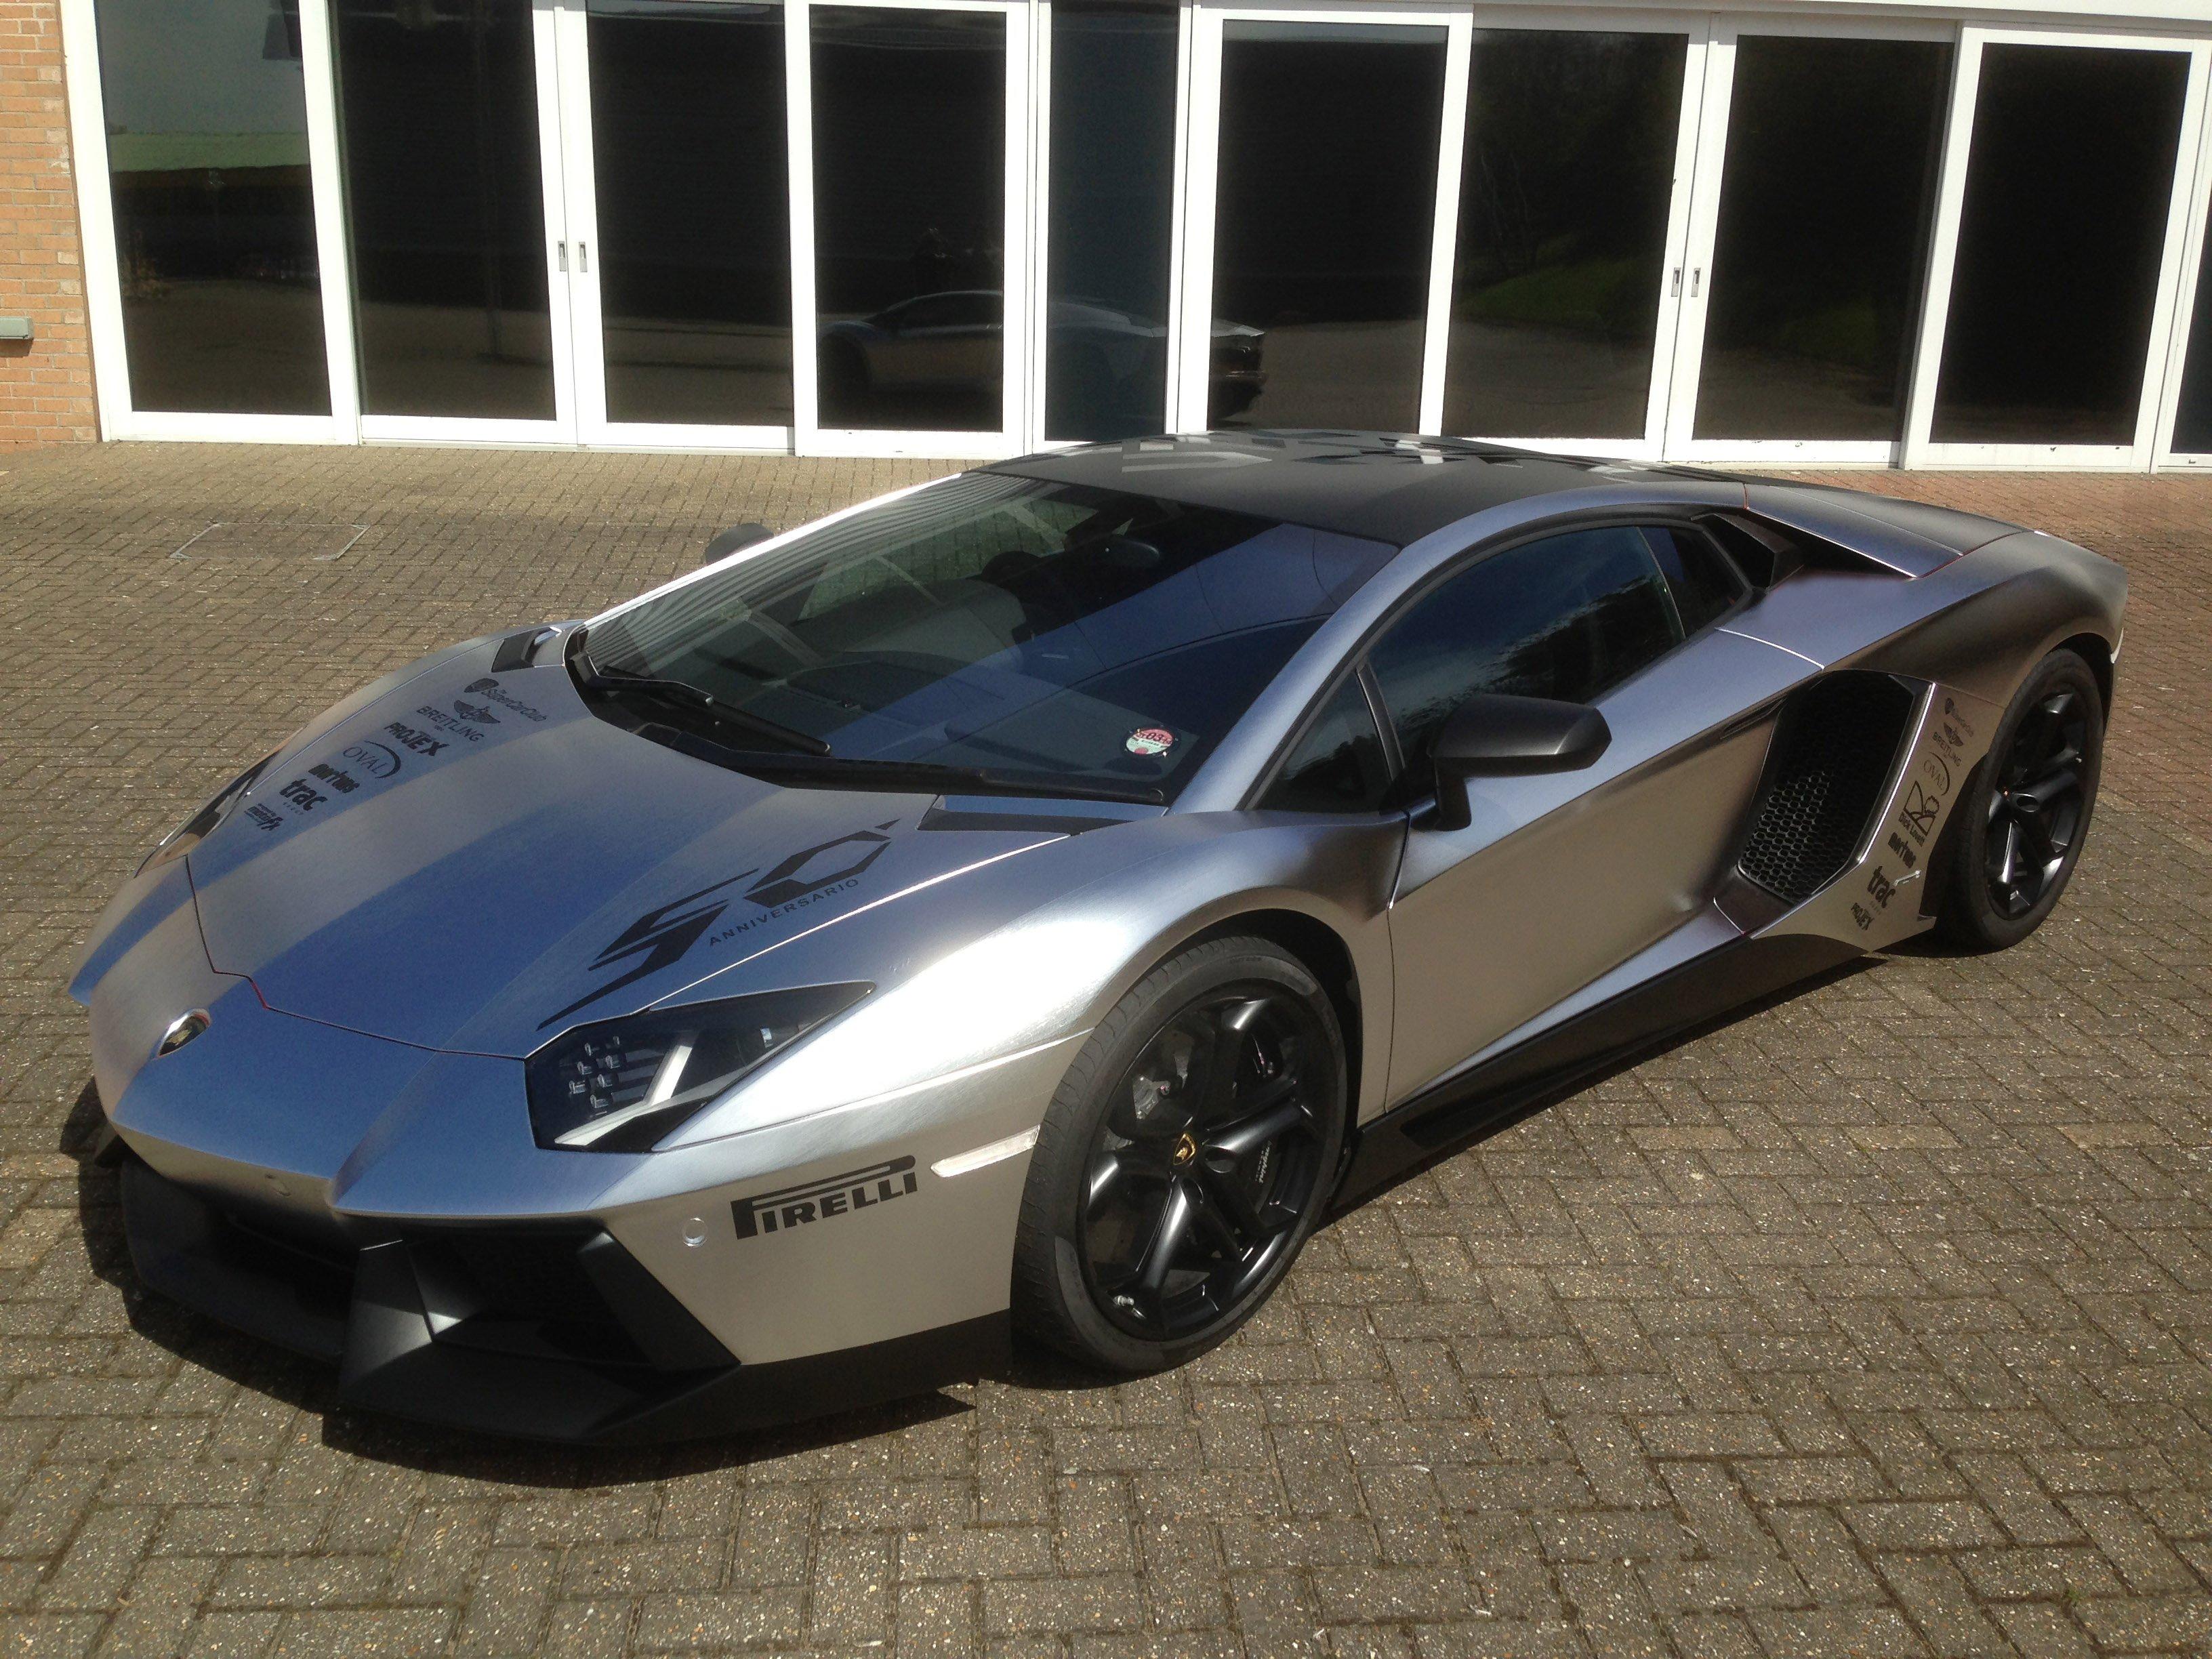 Aventador Chrome Lamborghini lp700 supercars Tuning ...